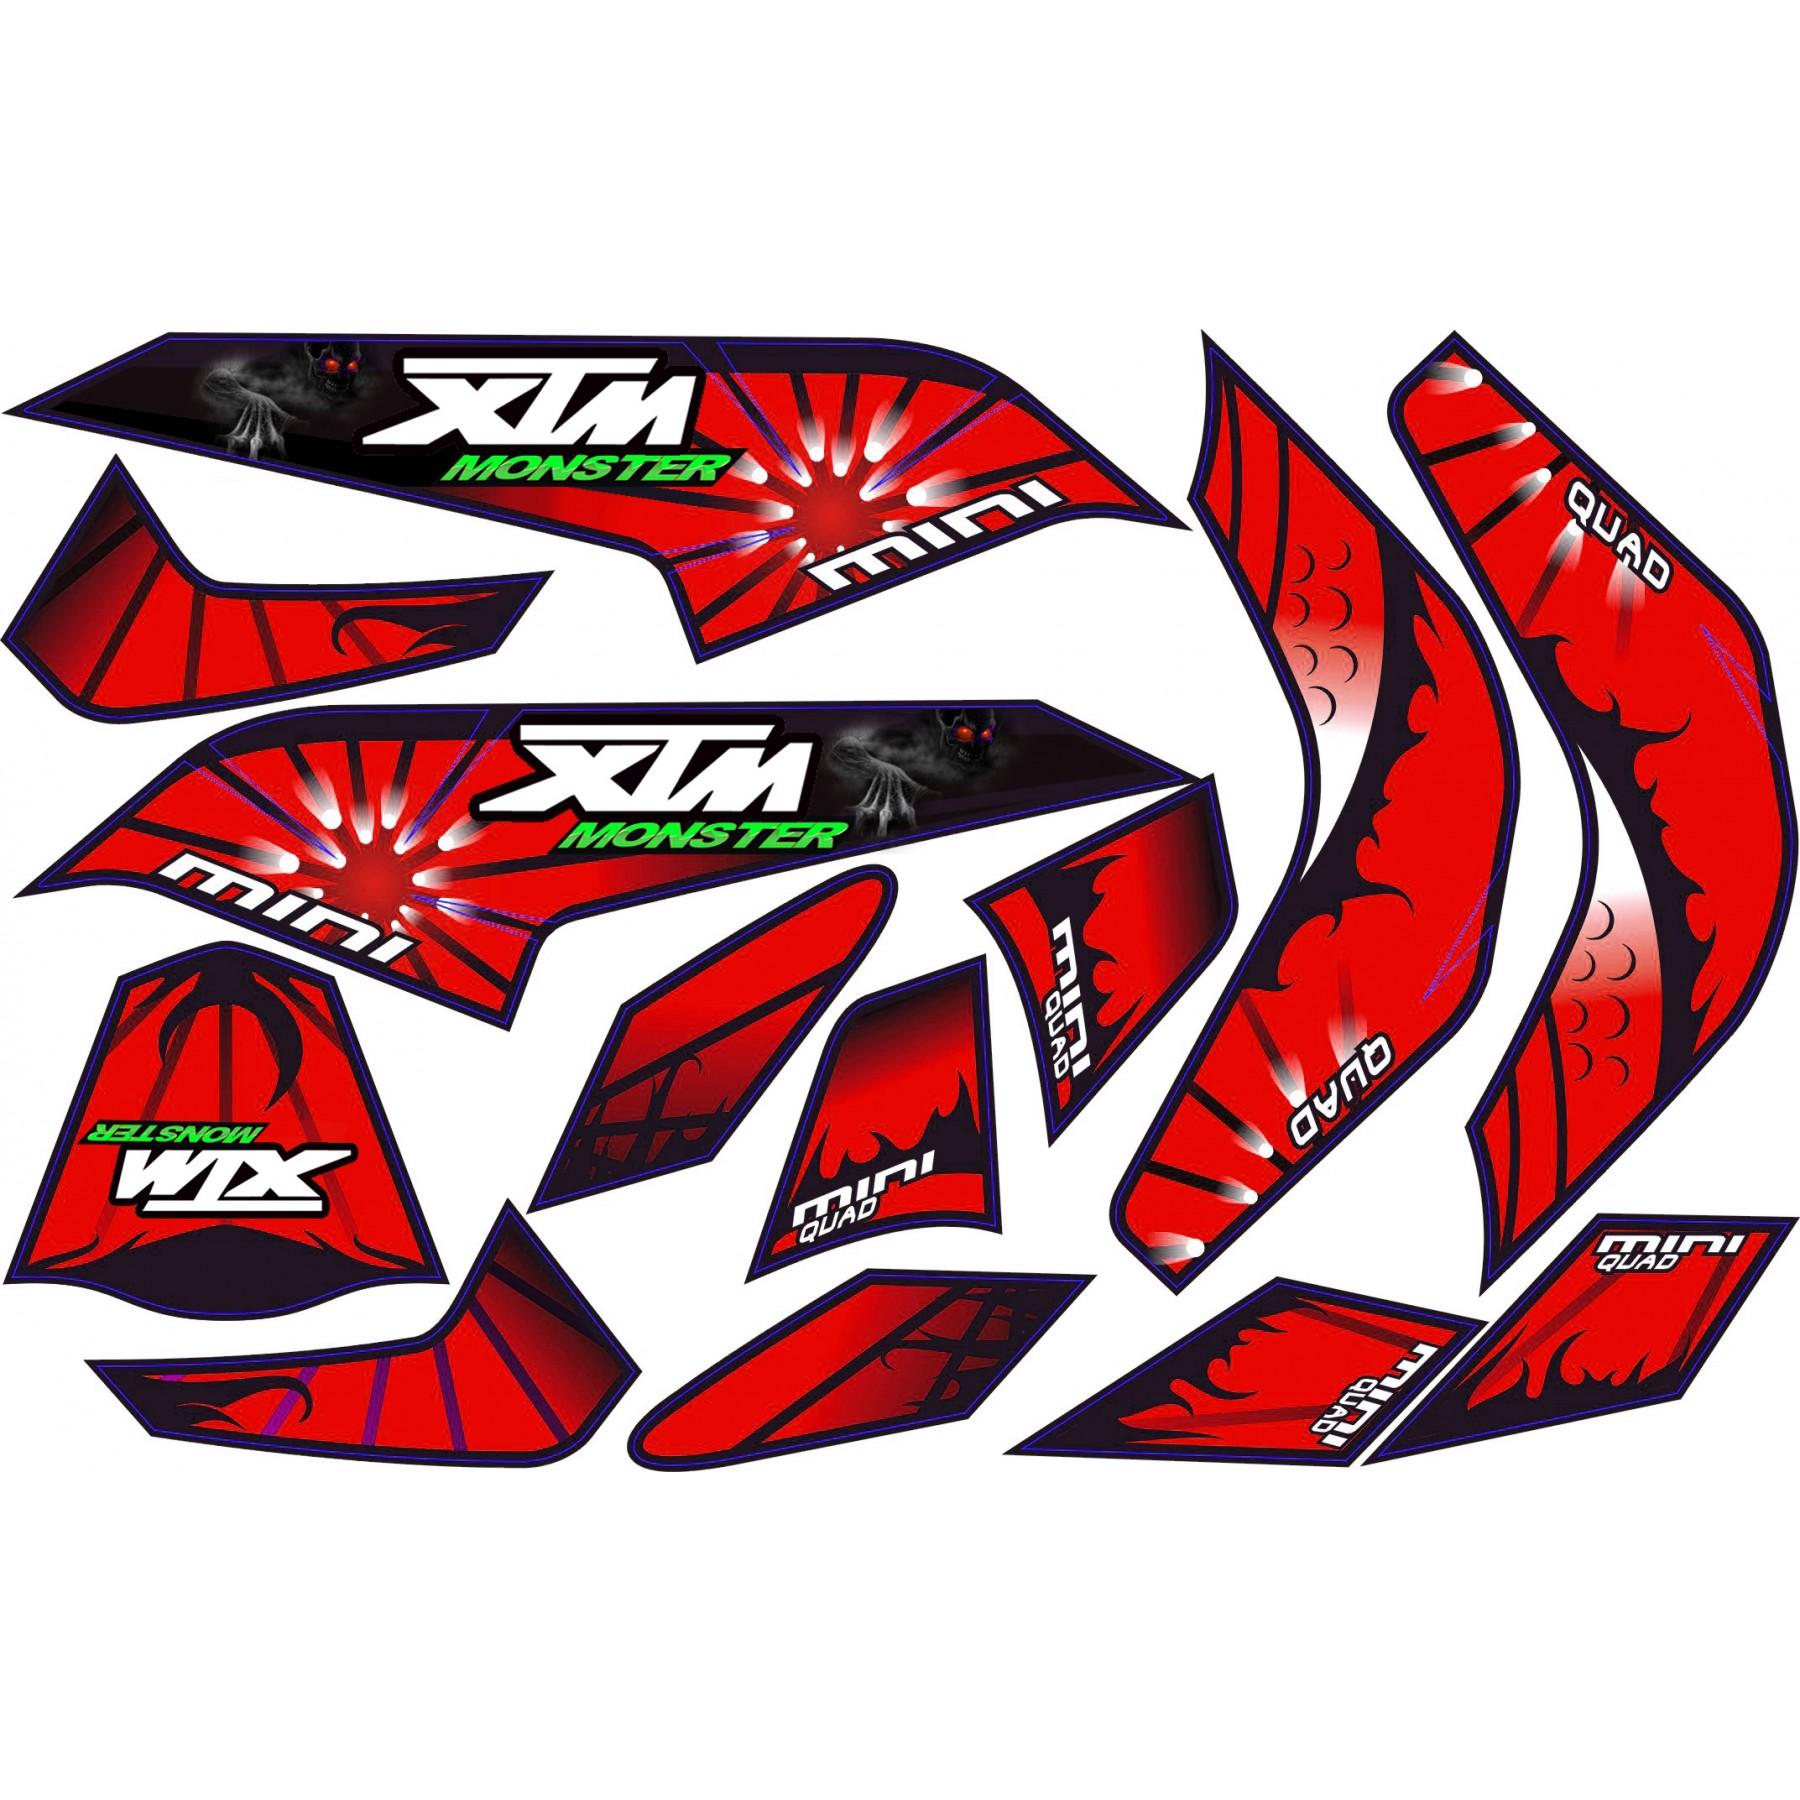 MINI QUAD BIKE XTM MONSTER STICKER KIT / DECALS / TRANSFERS IN RED